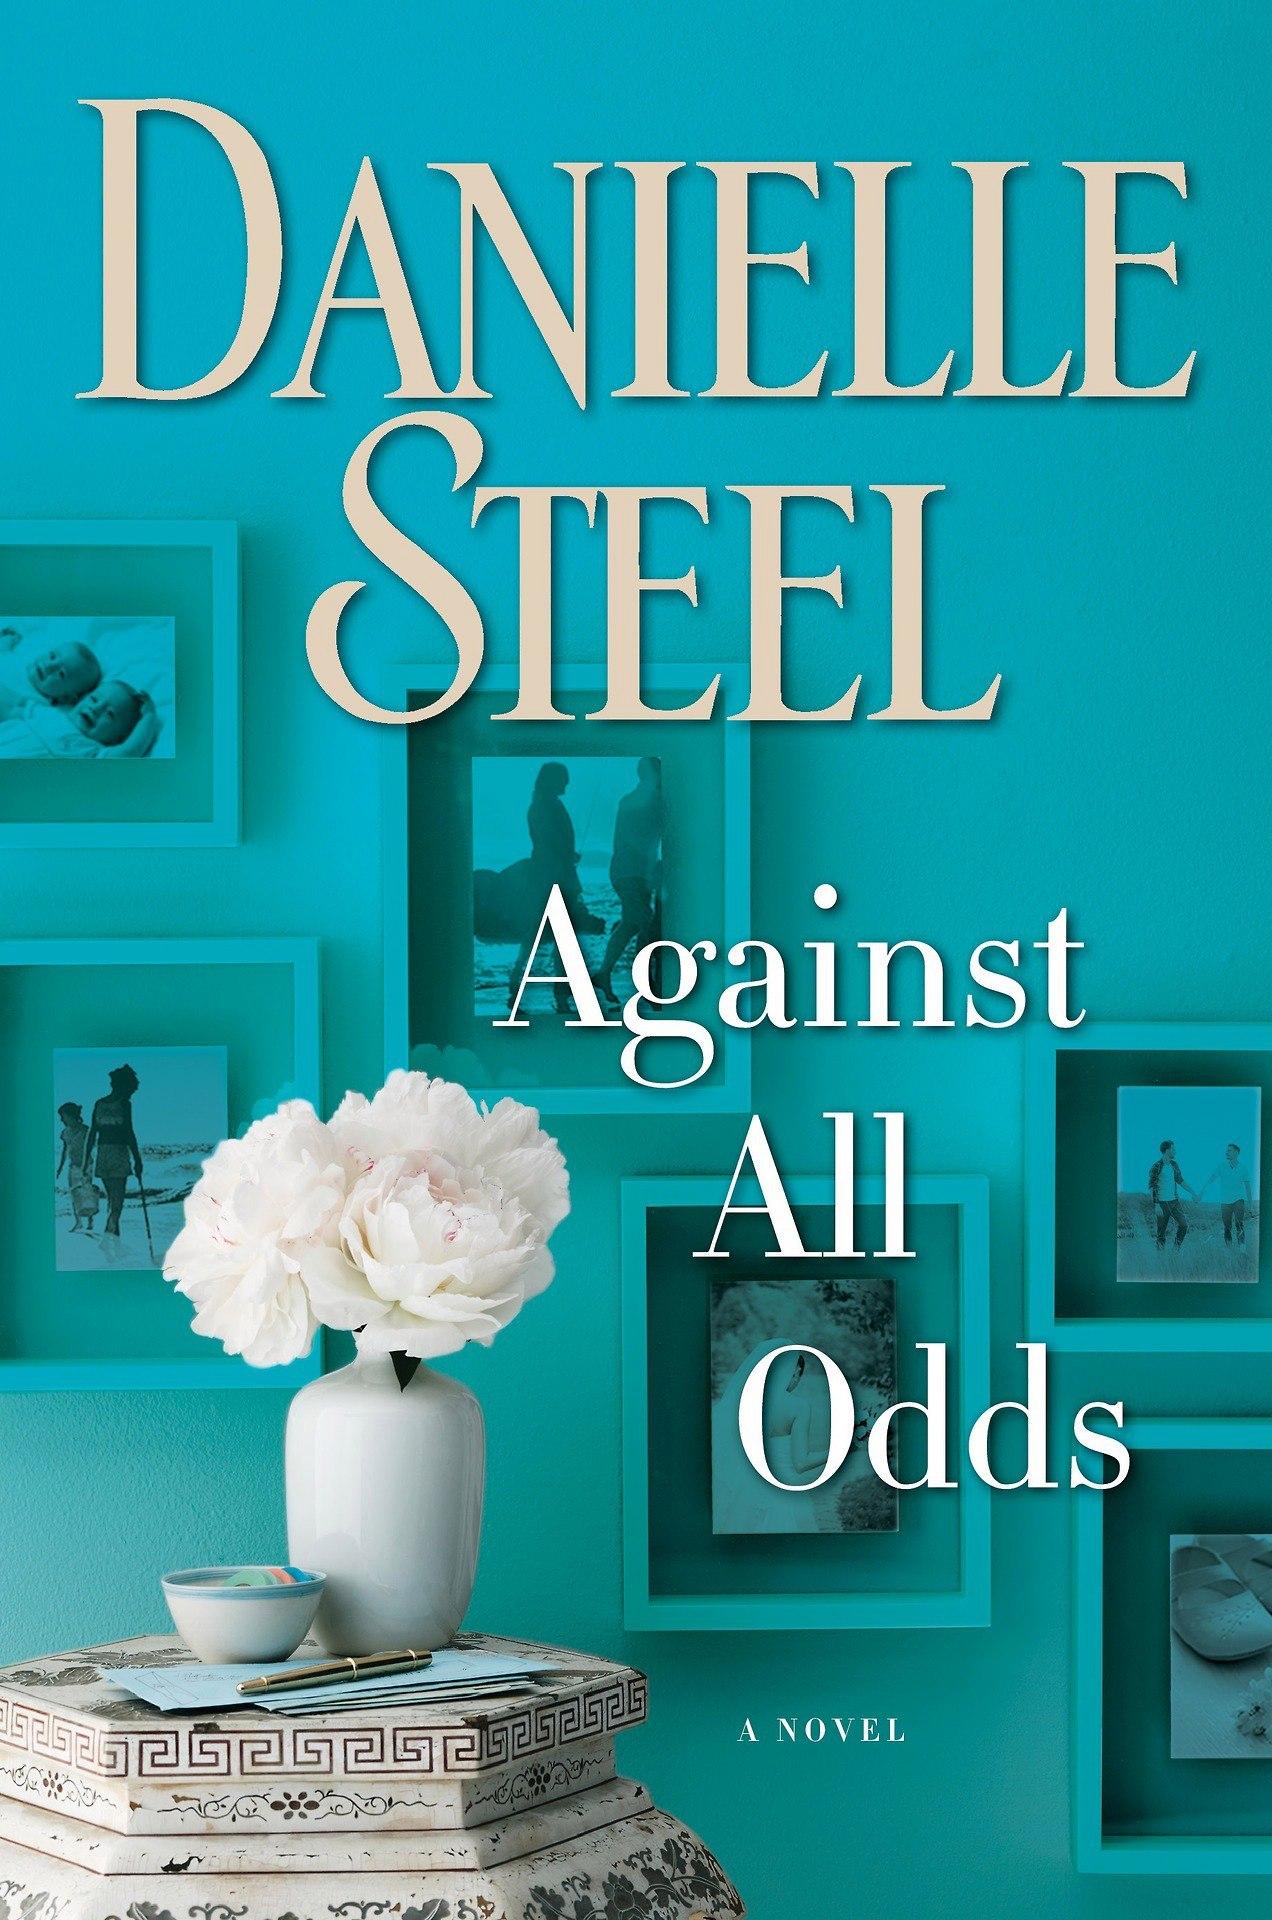 Danielle Steel – Against All Odds